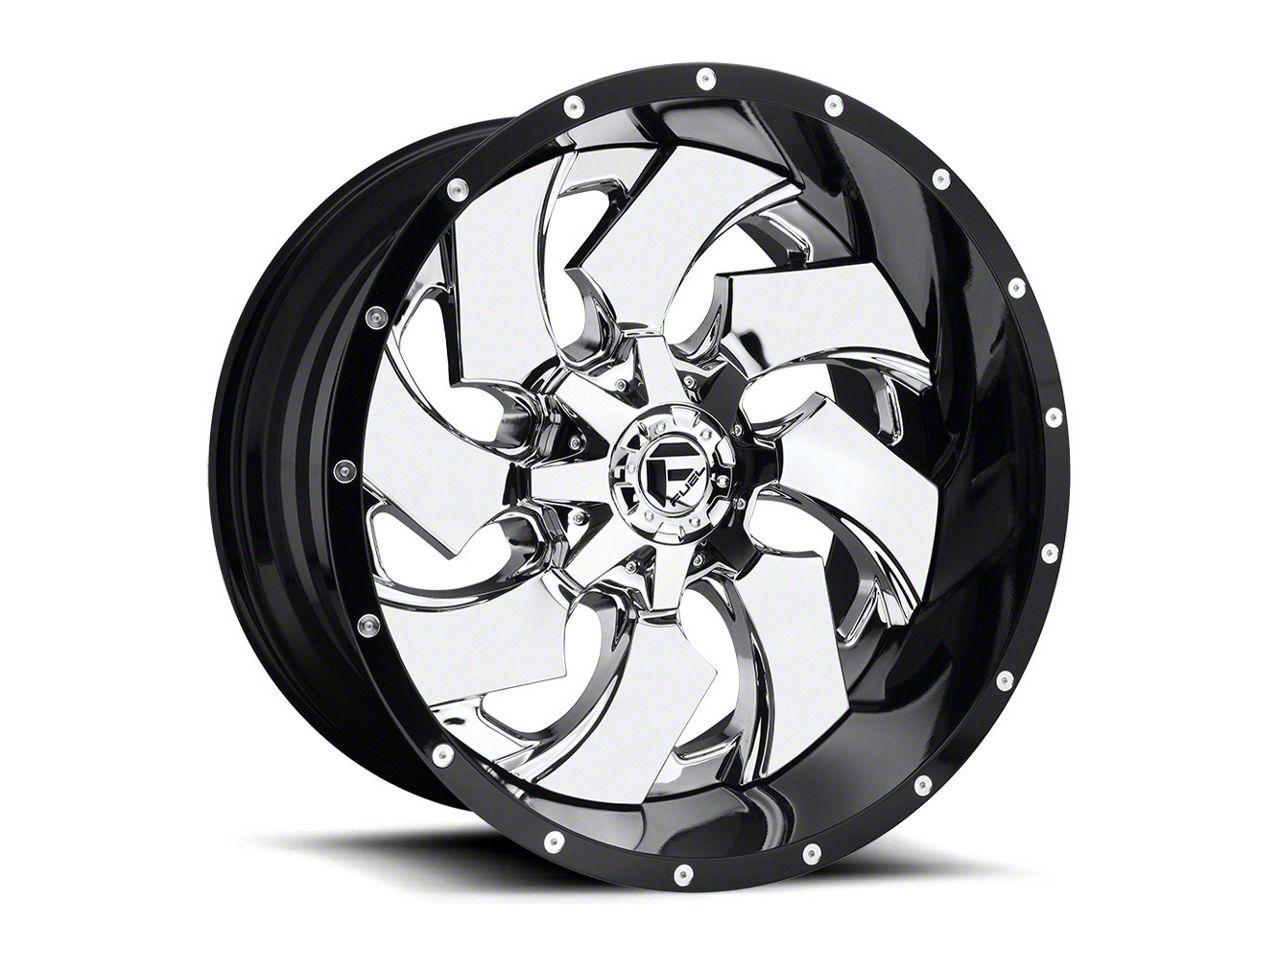 Fuel Wheels Cleaver Chrome 6-Lug Wheel - 20x14 (07-18 Sierra 1500)